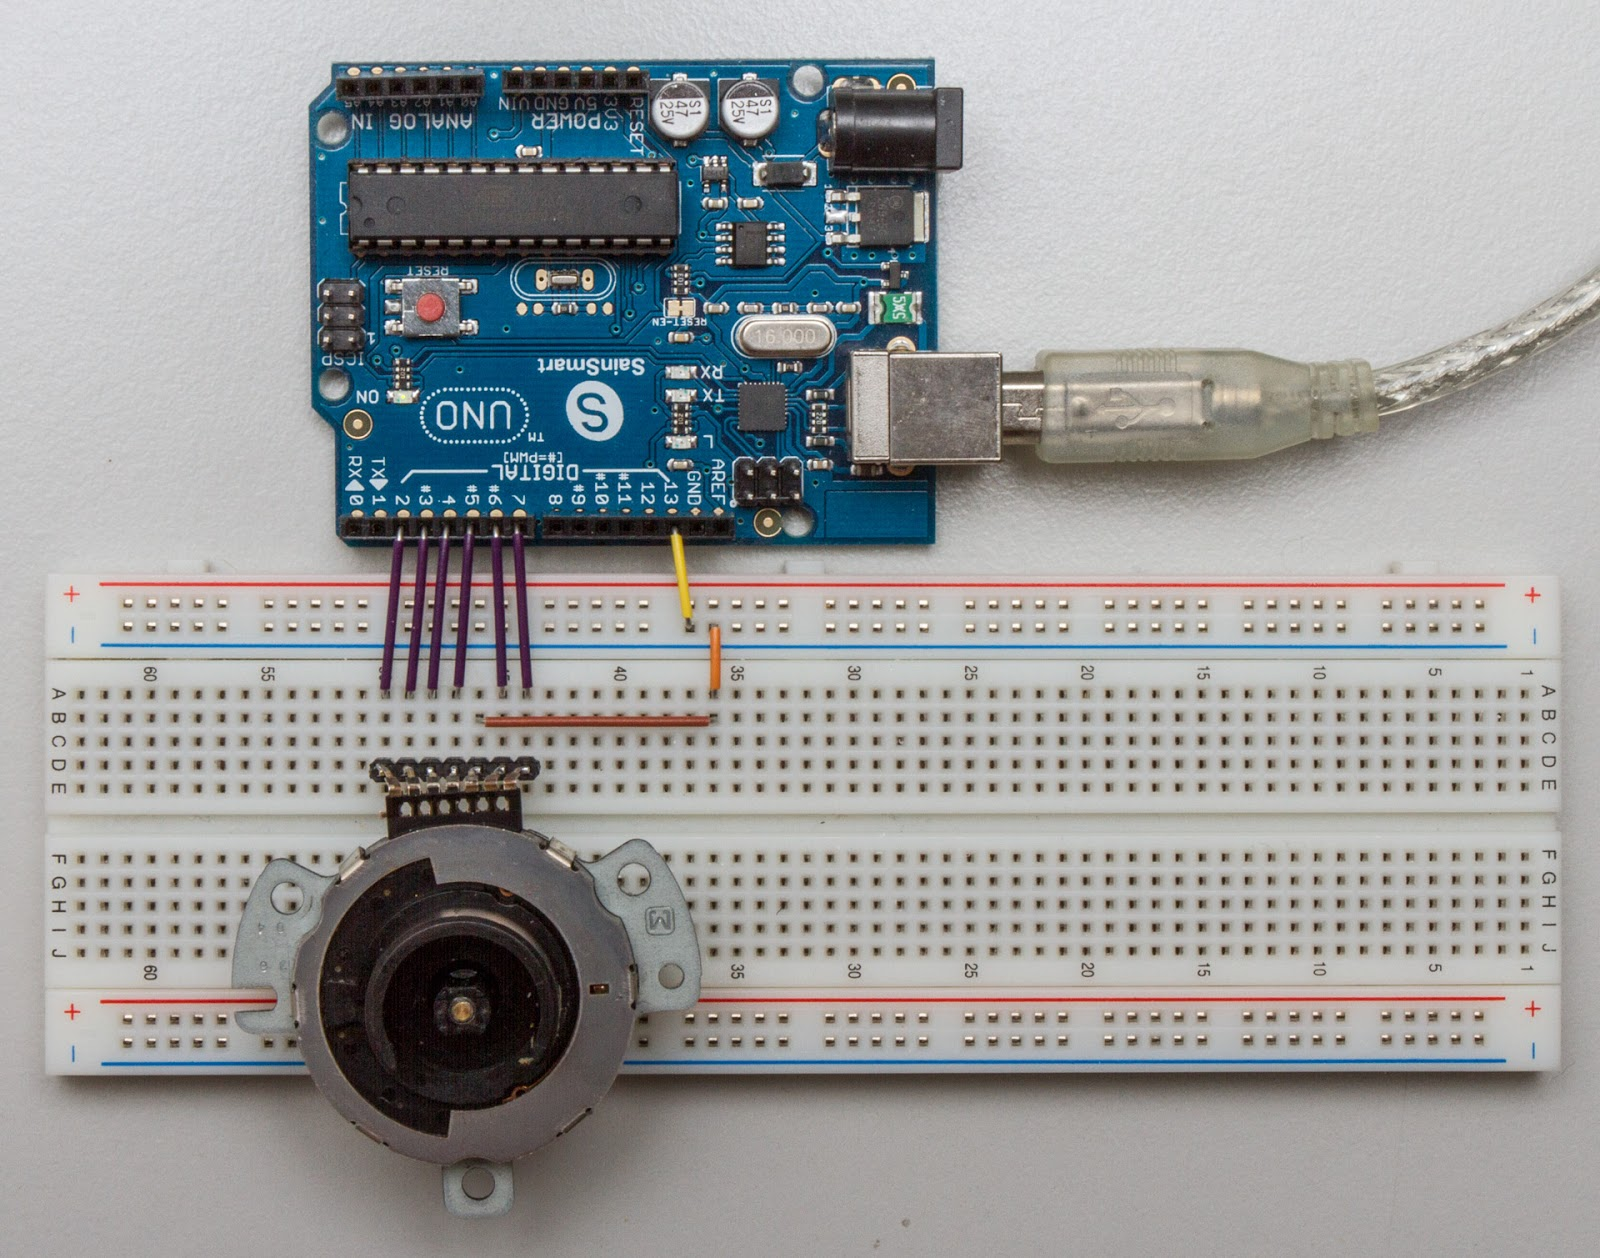 Using short range RF transmissions between two Arduino